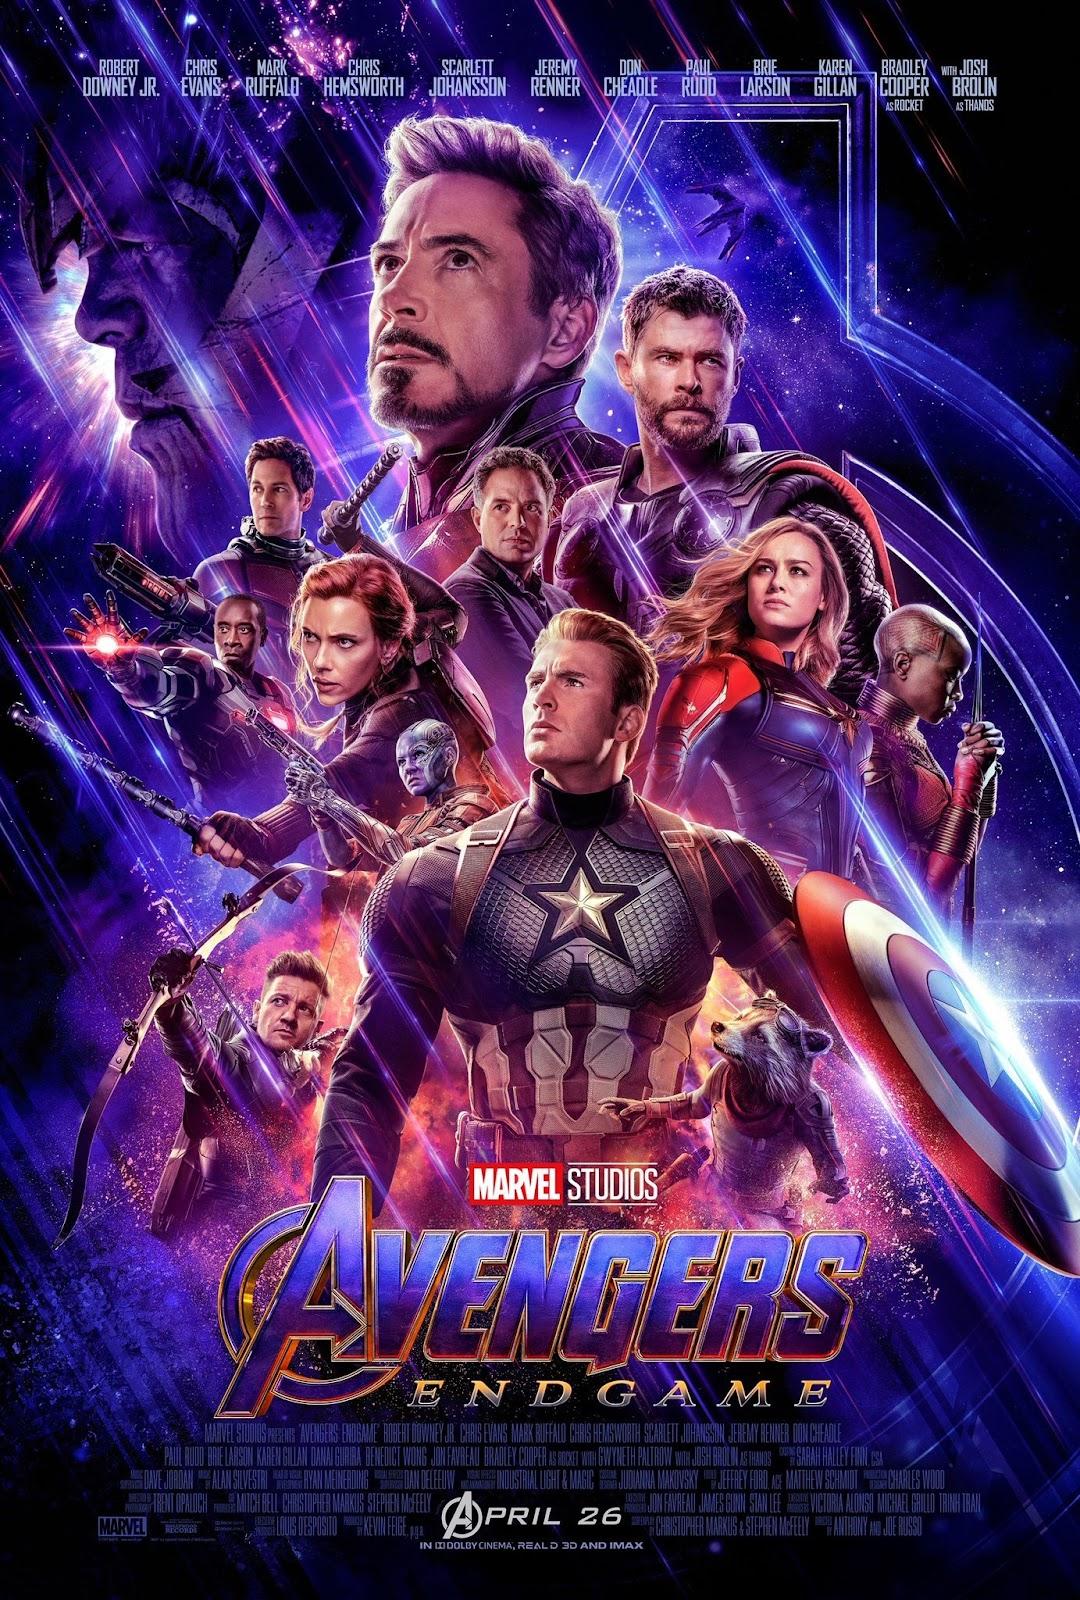 Avengers: Endgame; Director Russo Bros